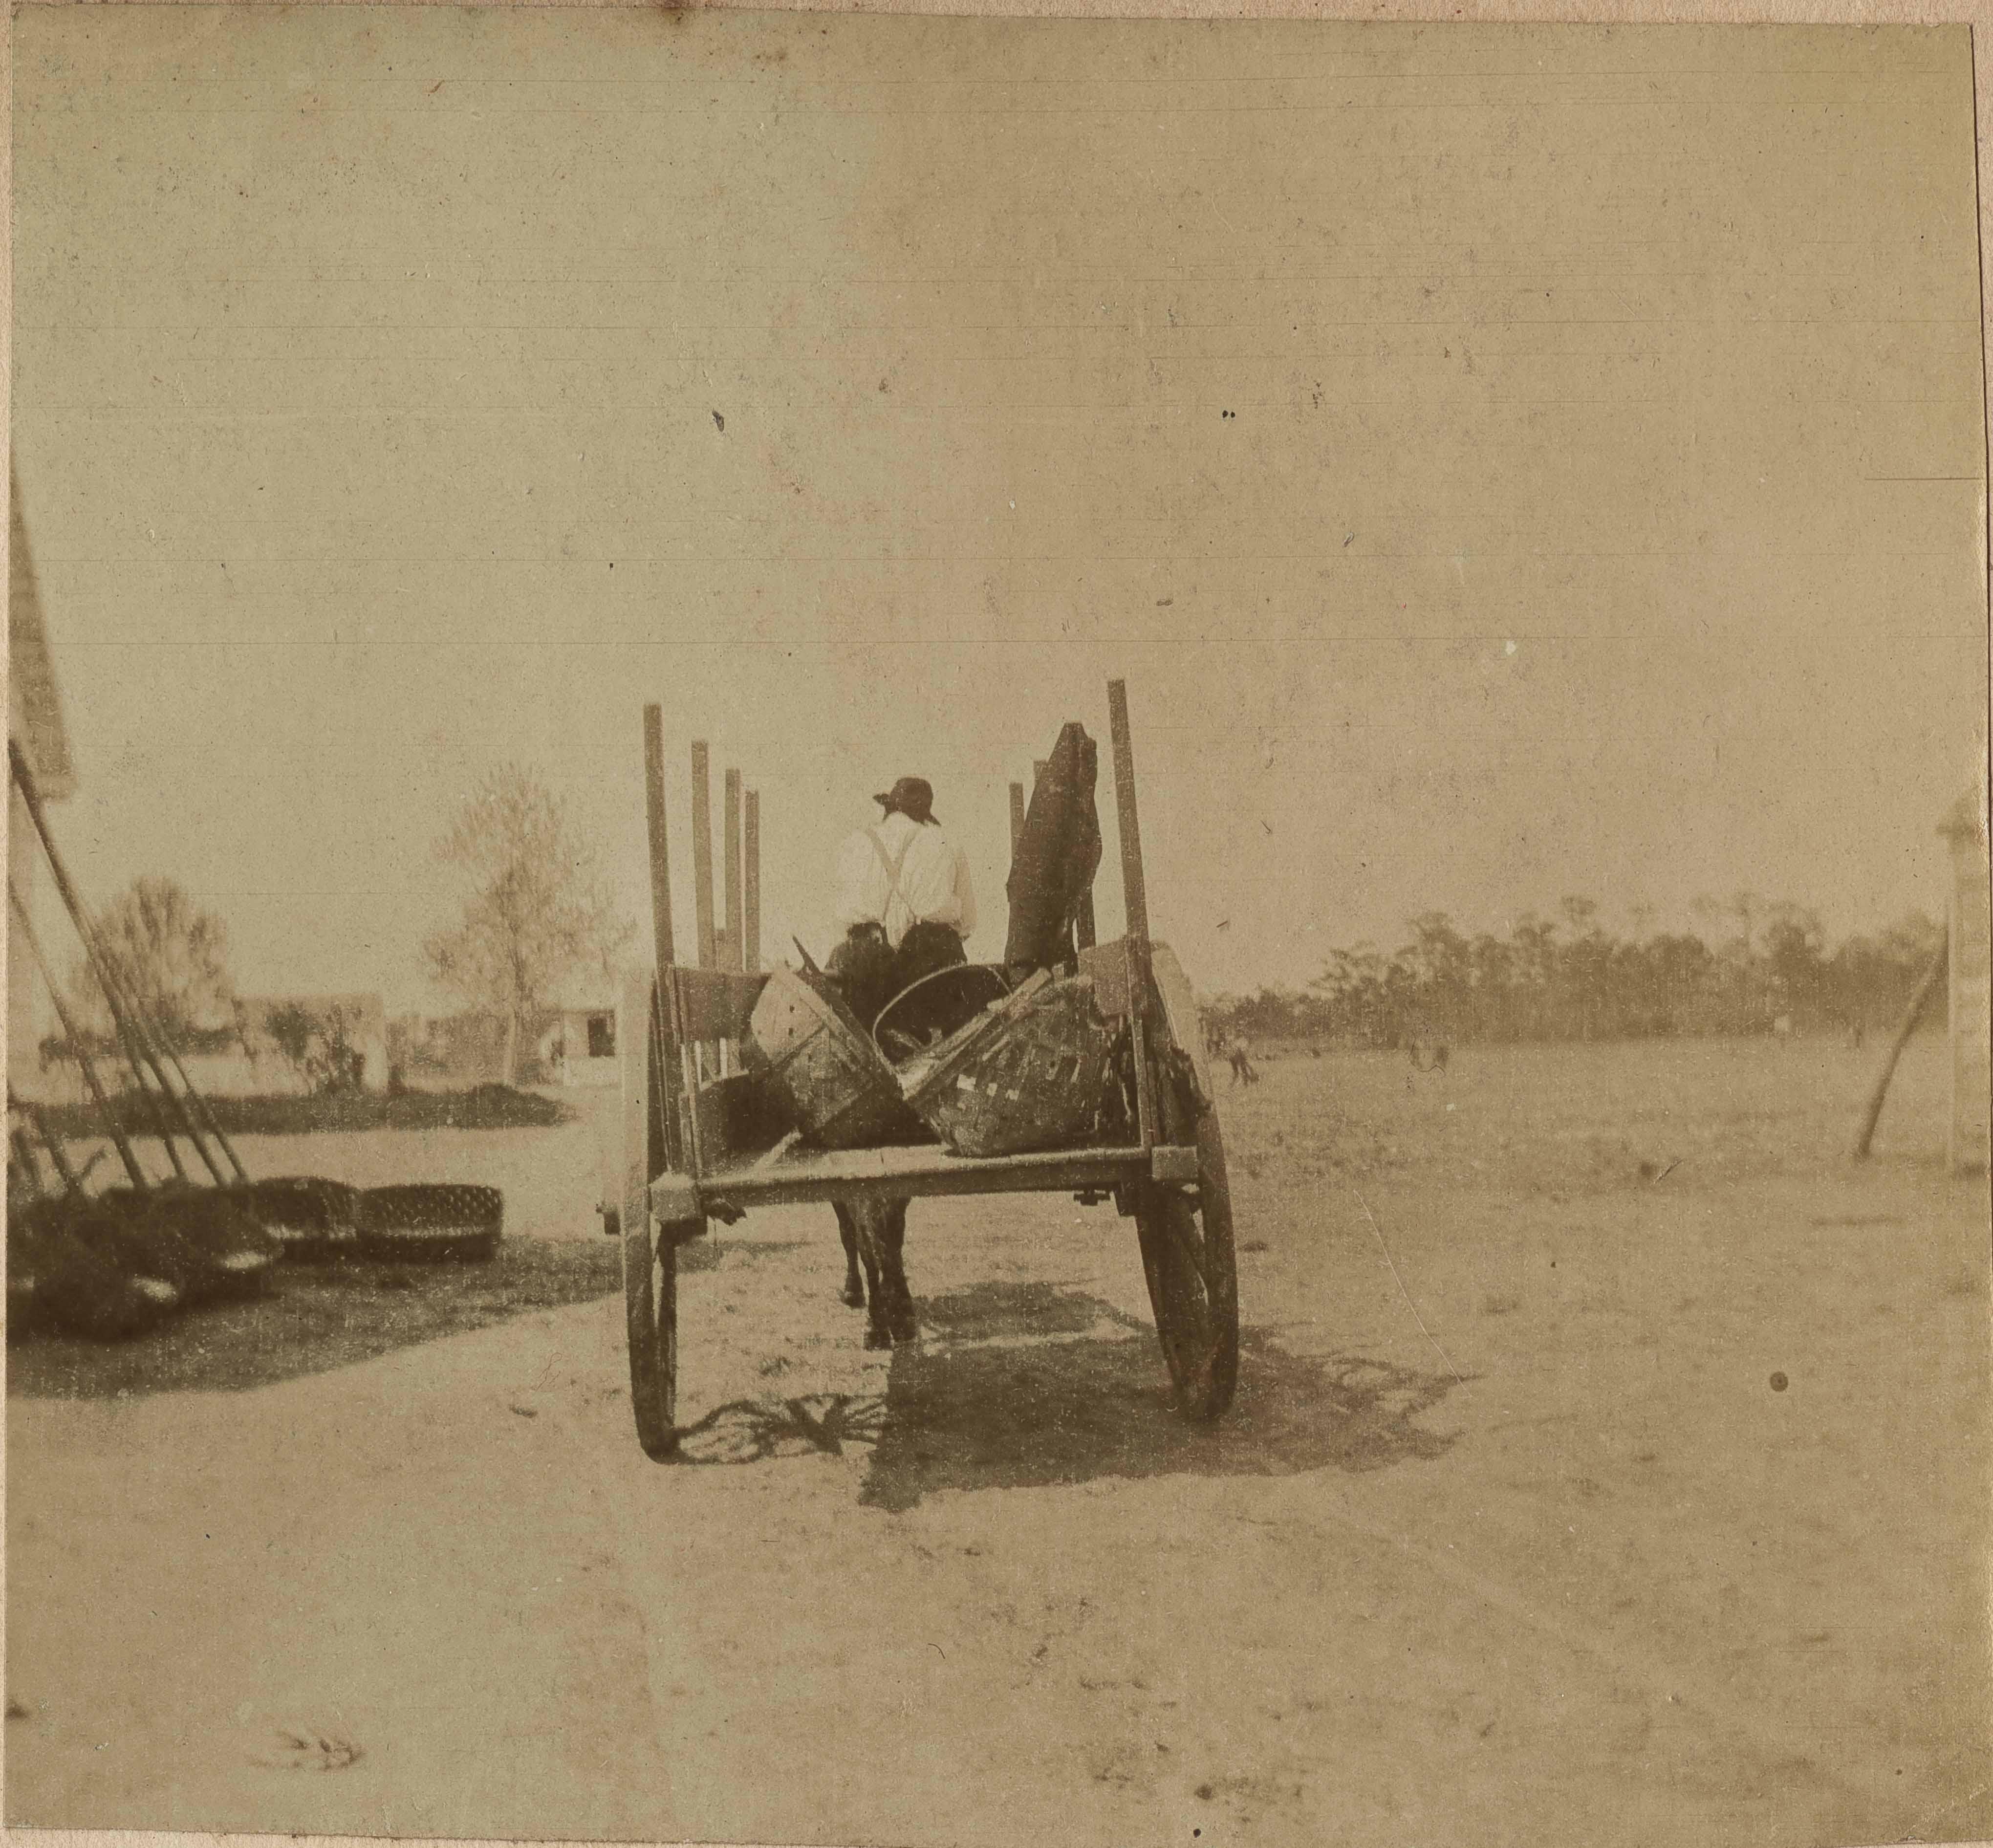 Loaded wagon